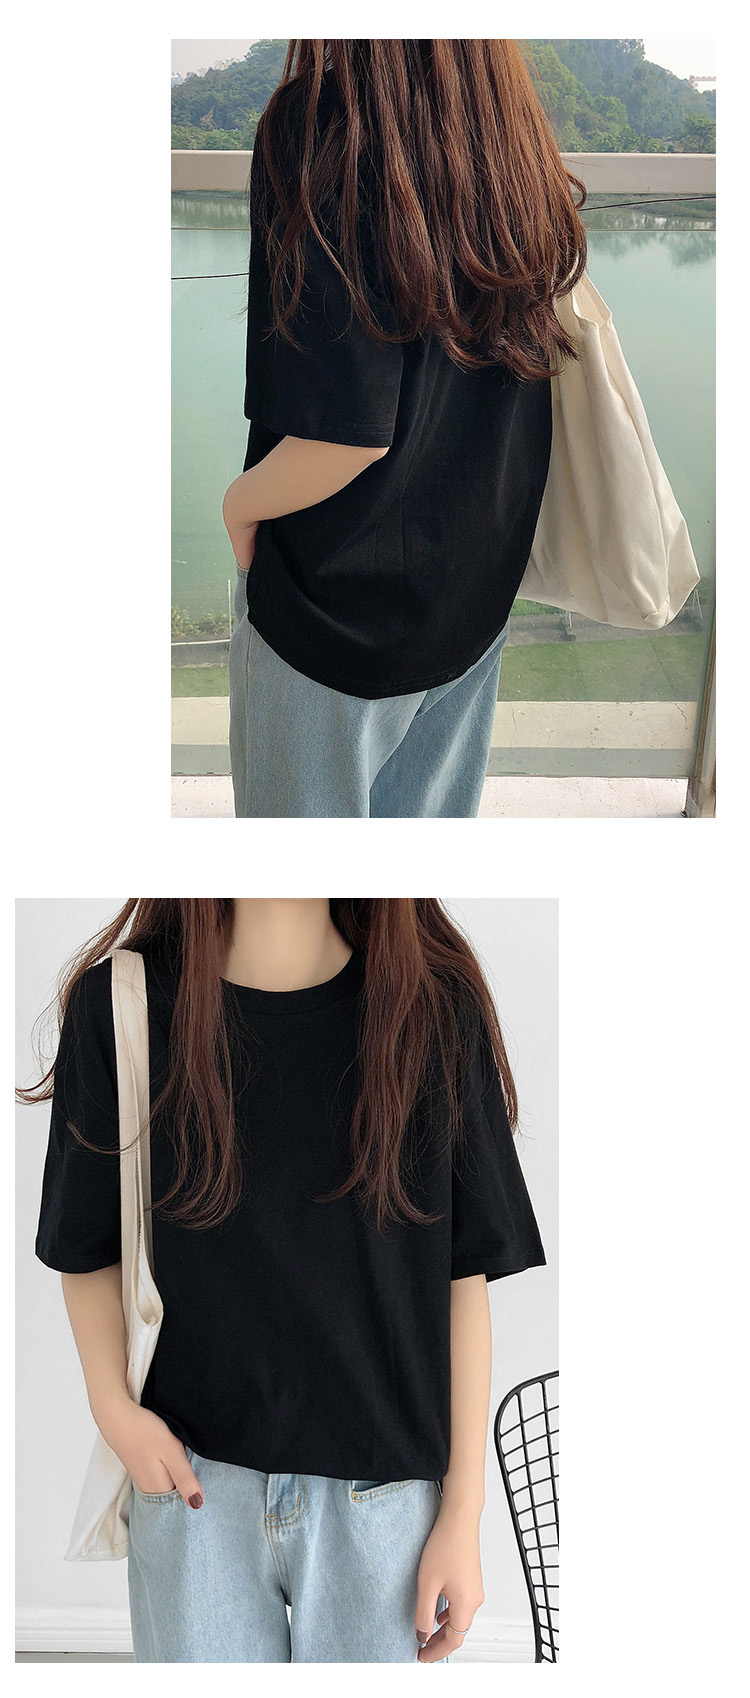 H0024bb73d2394bd69de828b4f60508eb9 - Summer O-Neck Short Sleeves Minimalist Loose Basic T-Shirt